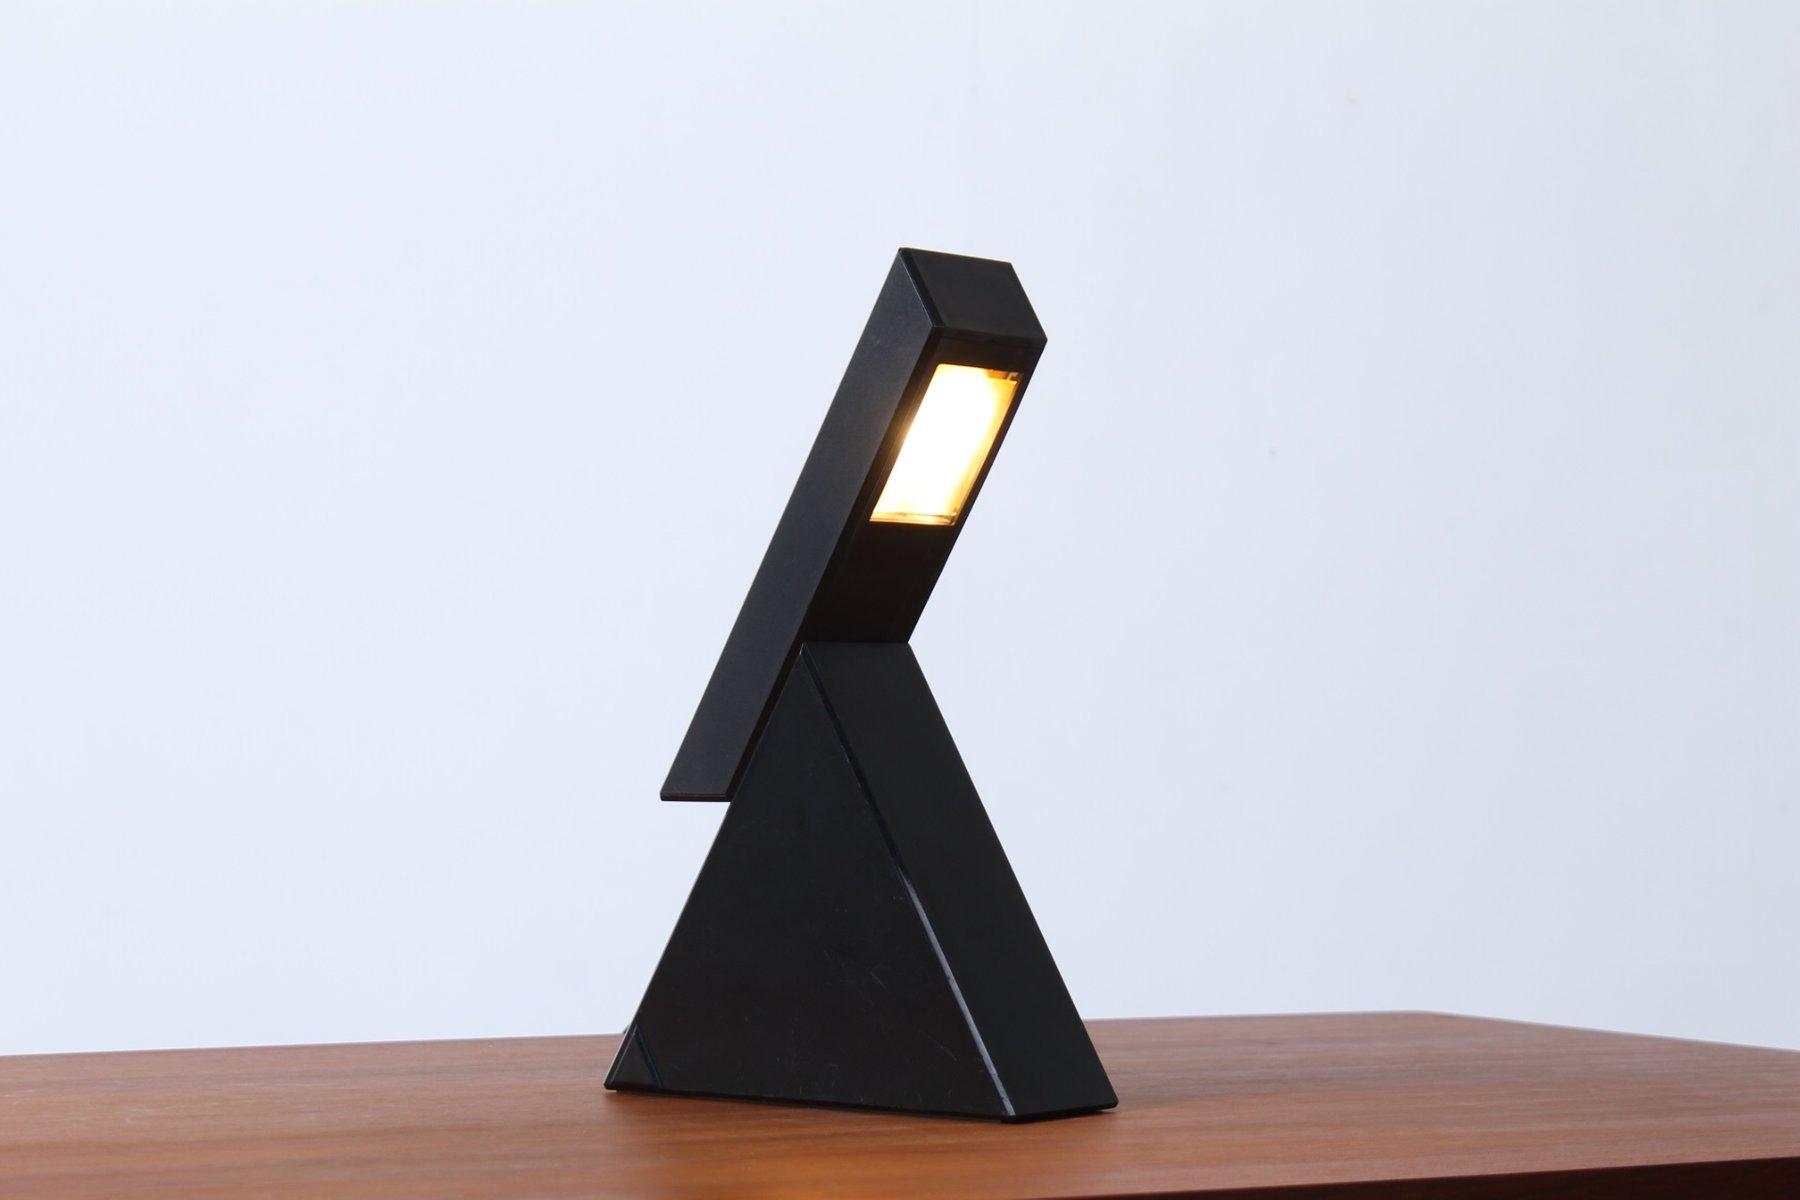 Lampe de bureau delta noire ajustable vintage par mario bertorelle